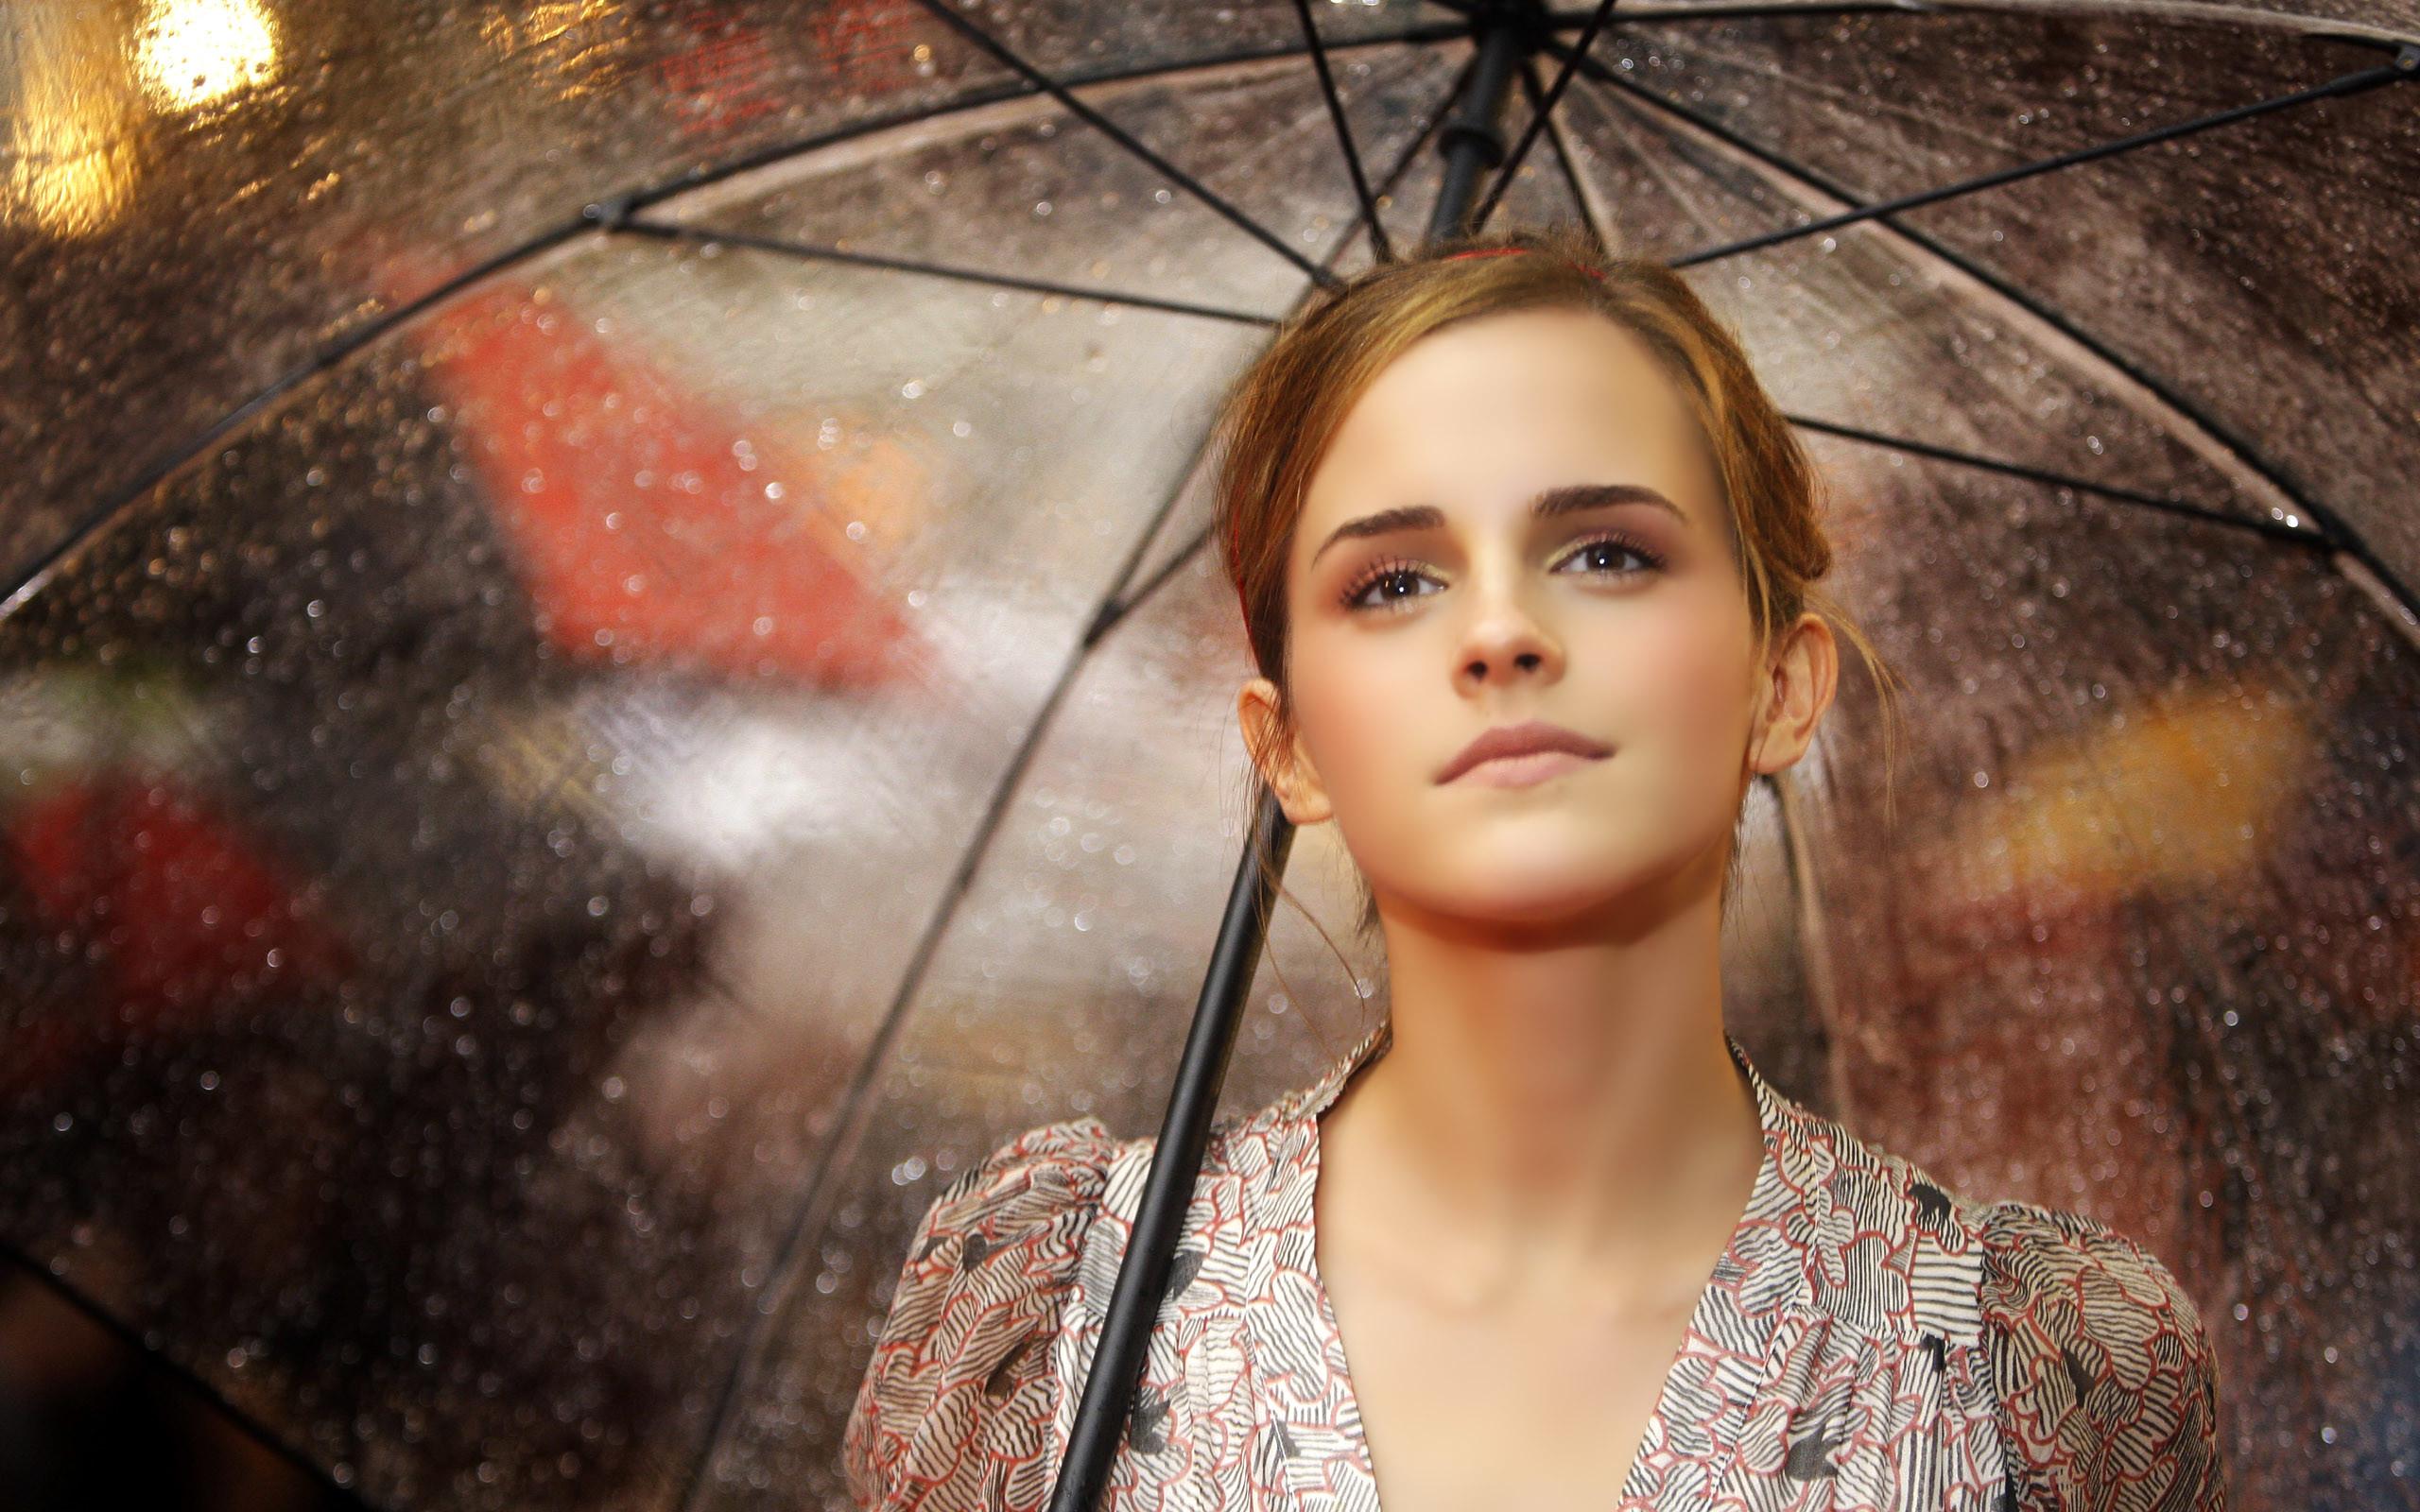 Emma Watson Wallpapers Free Download HD Hot Beautiful Actress Images   HD  Wallpapers   Pinterest   Emma watson wallpaper, Wallpaper and Wallpaper …